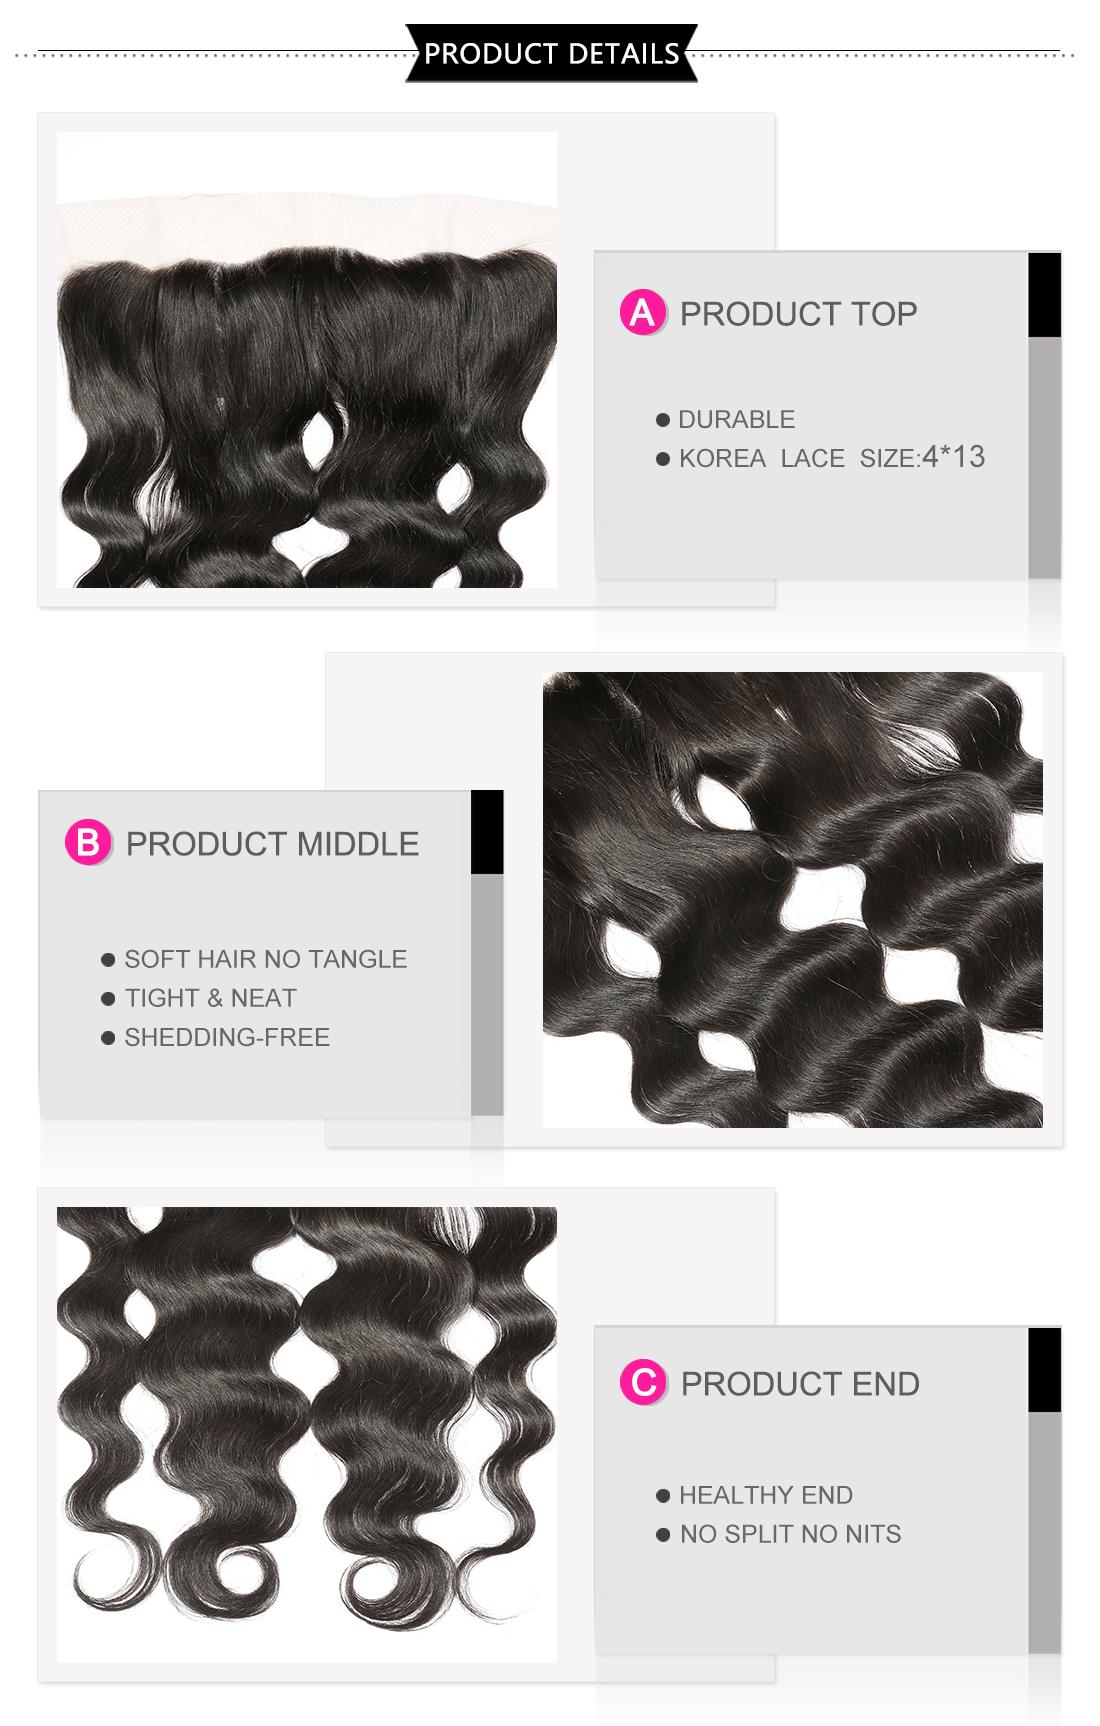 bundle deals with lace frontal